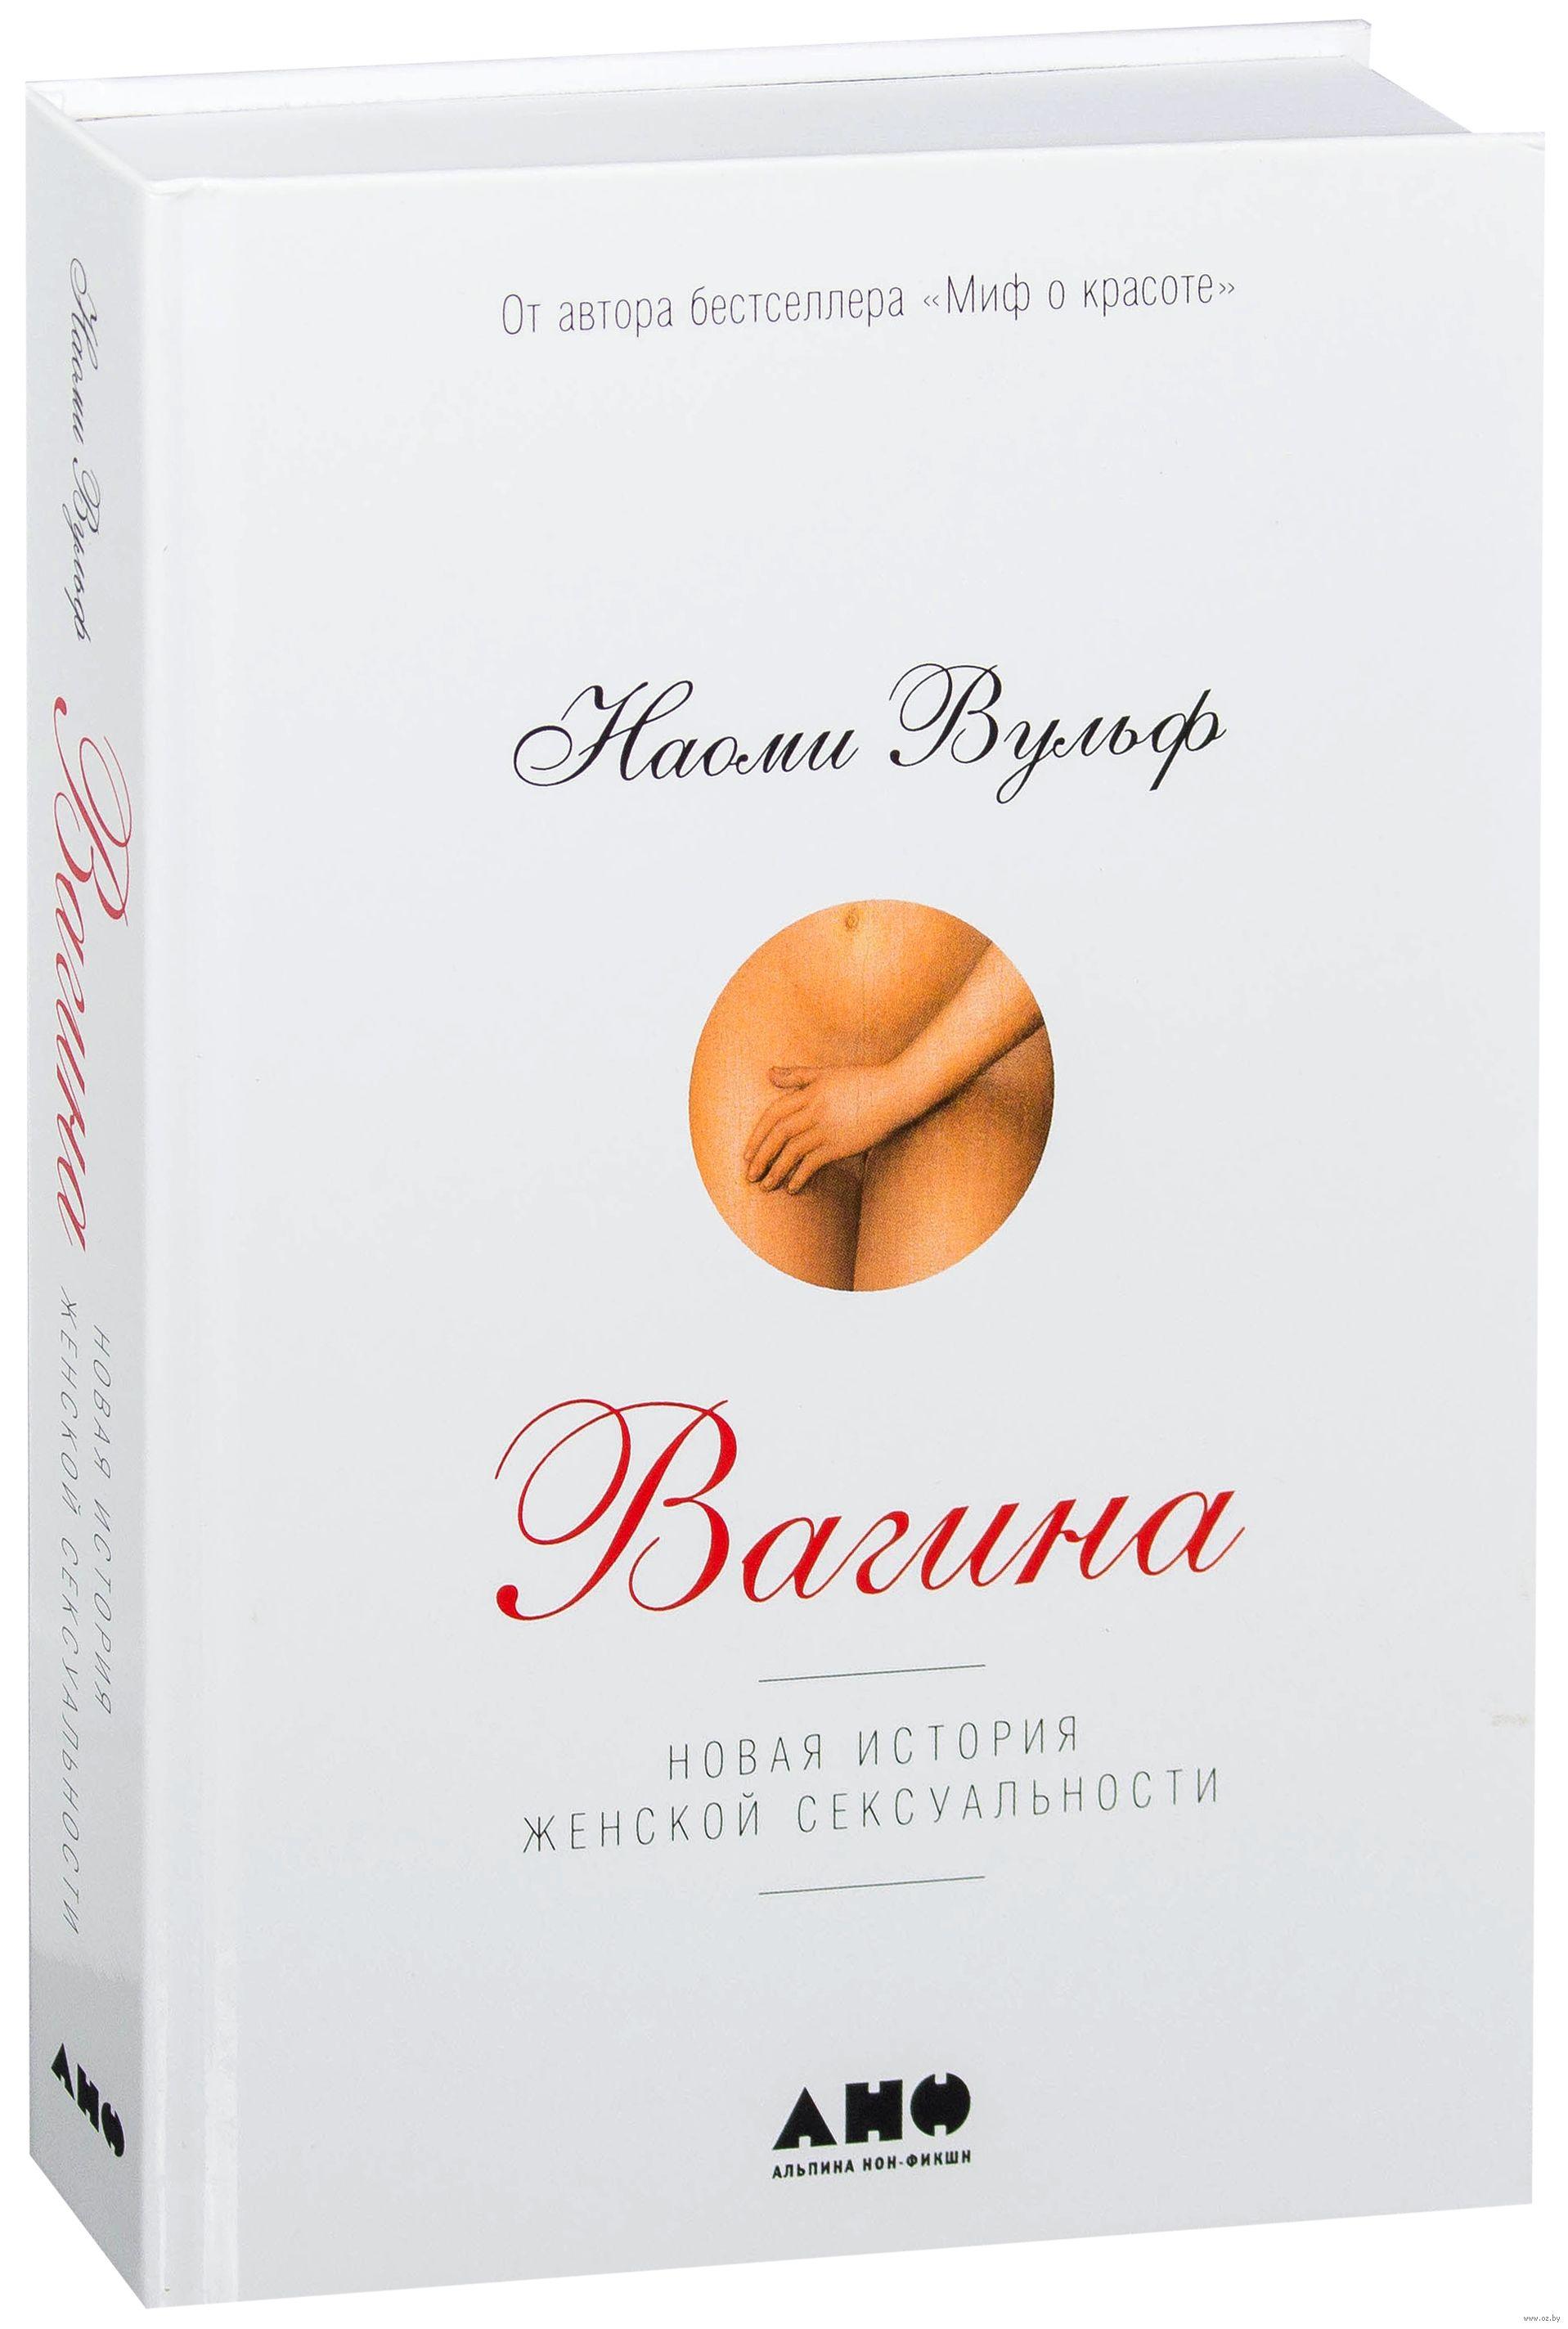 naomi-vulf-vagina